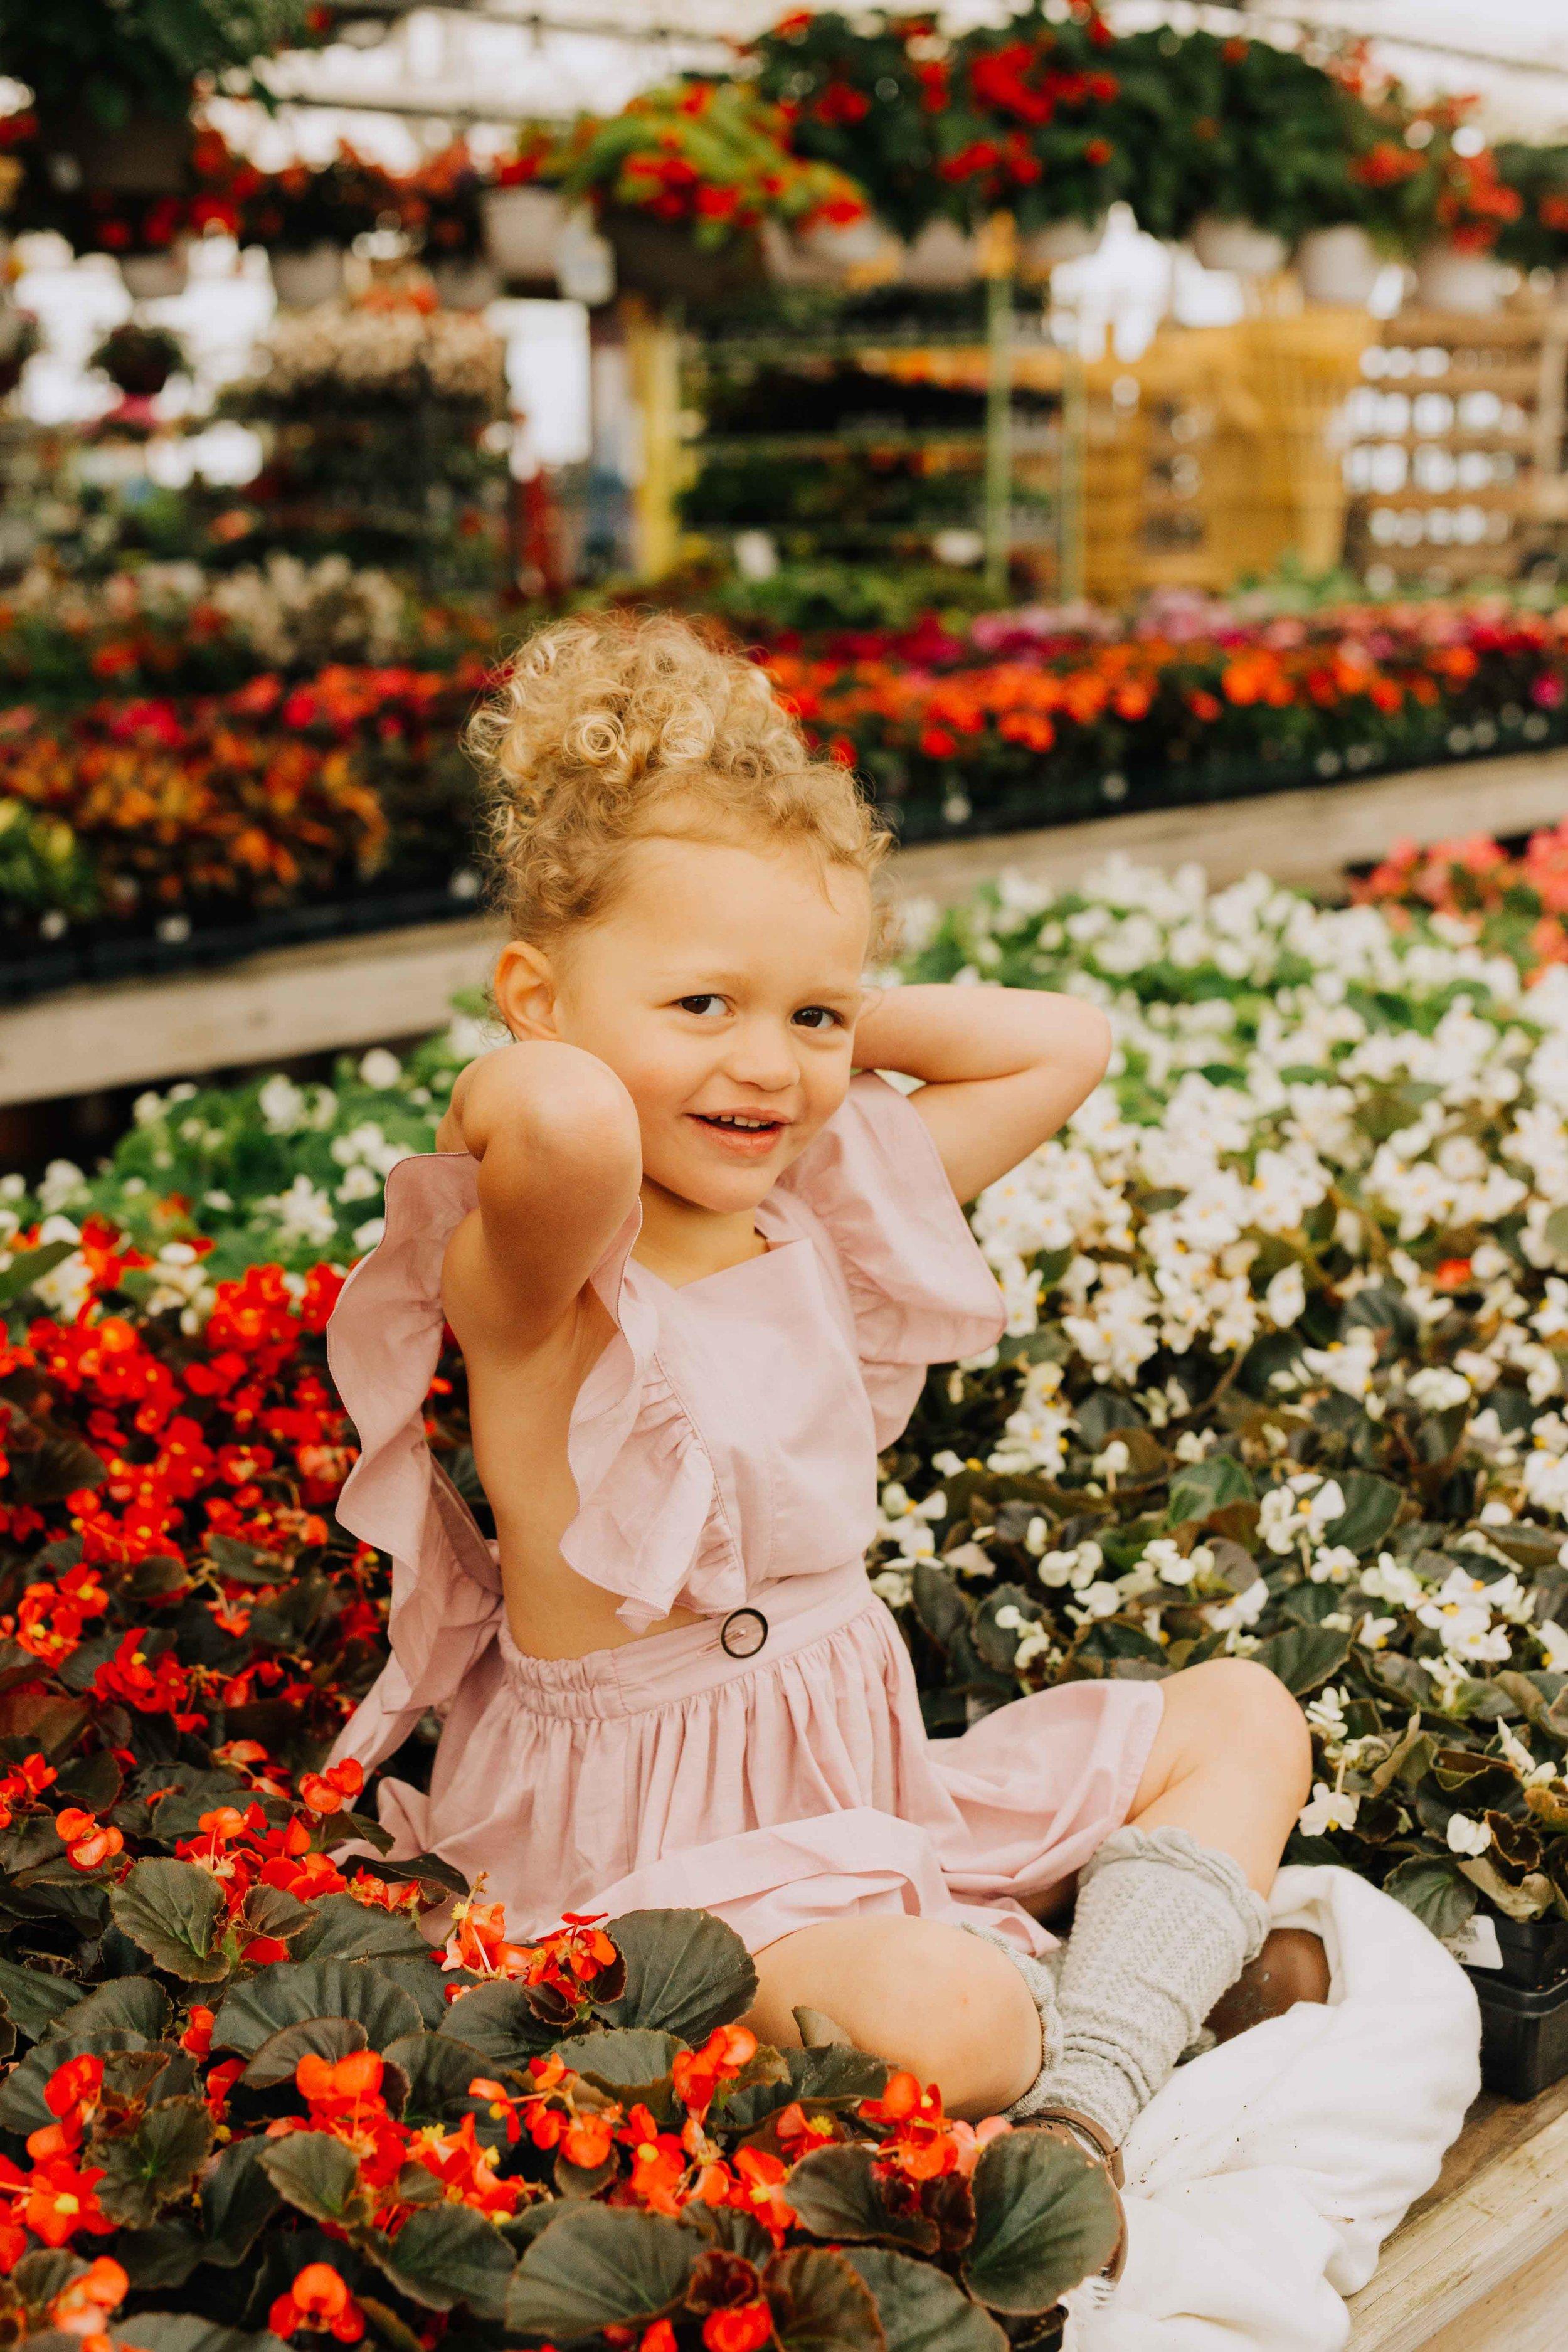 Merrifield-garden-greenhouse-indoor-Jacqueline-Waters-Photography-Red-dress-family- (257).jpg